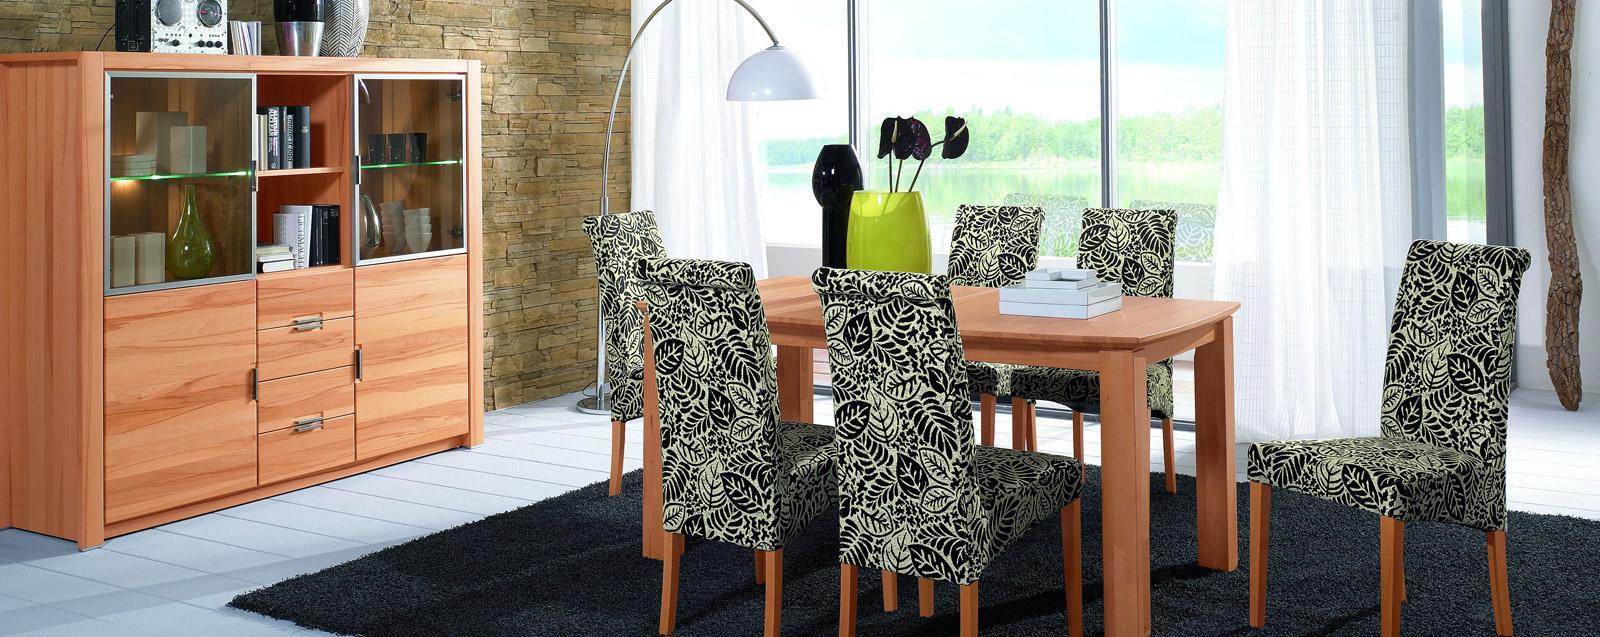 Möbeldirektverkauf